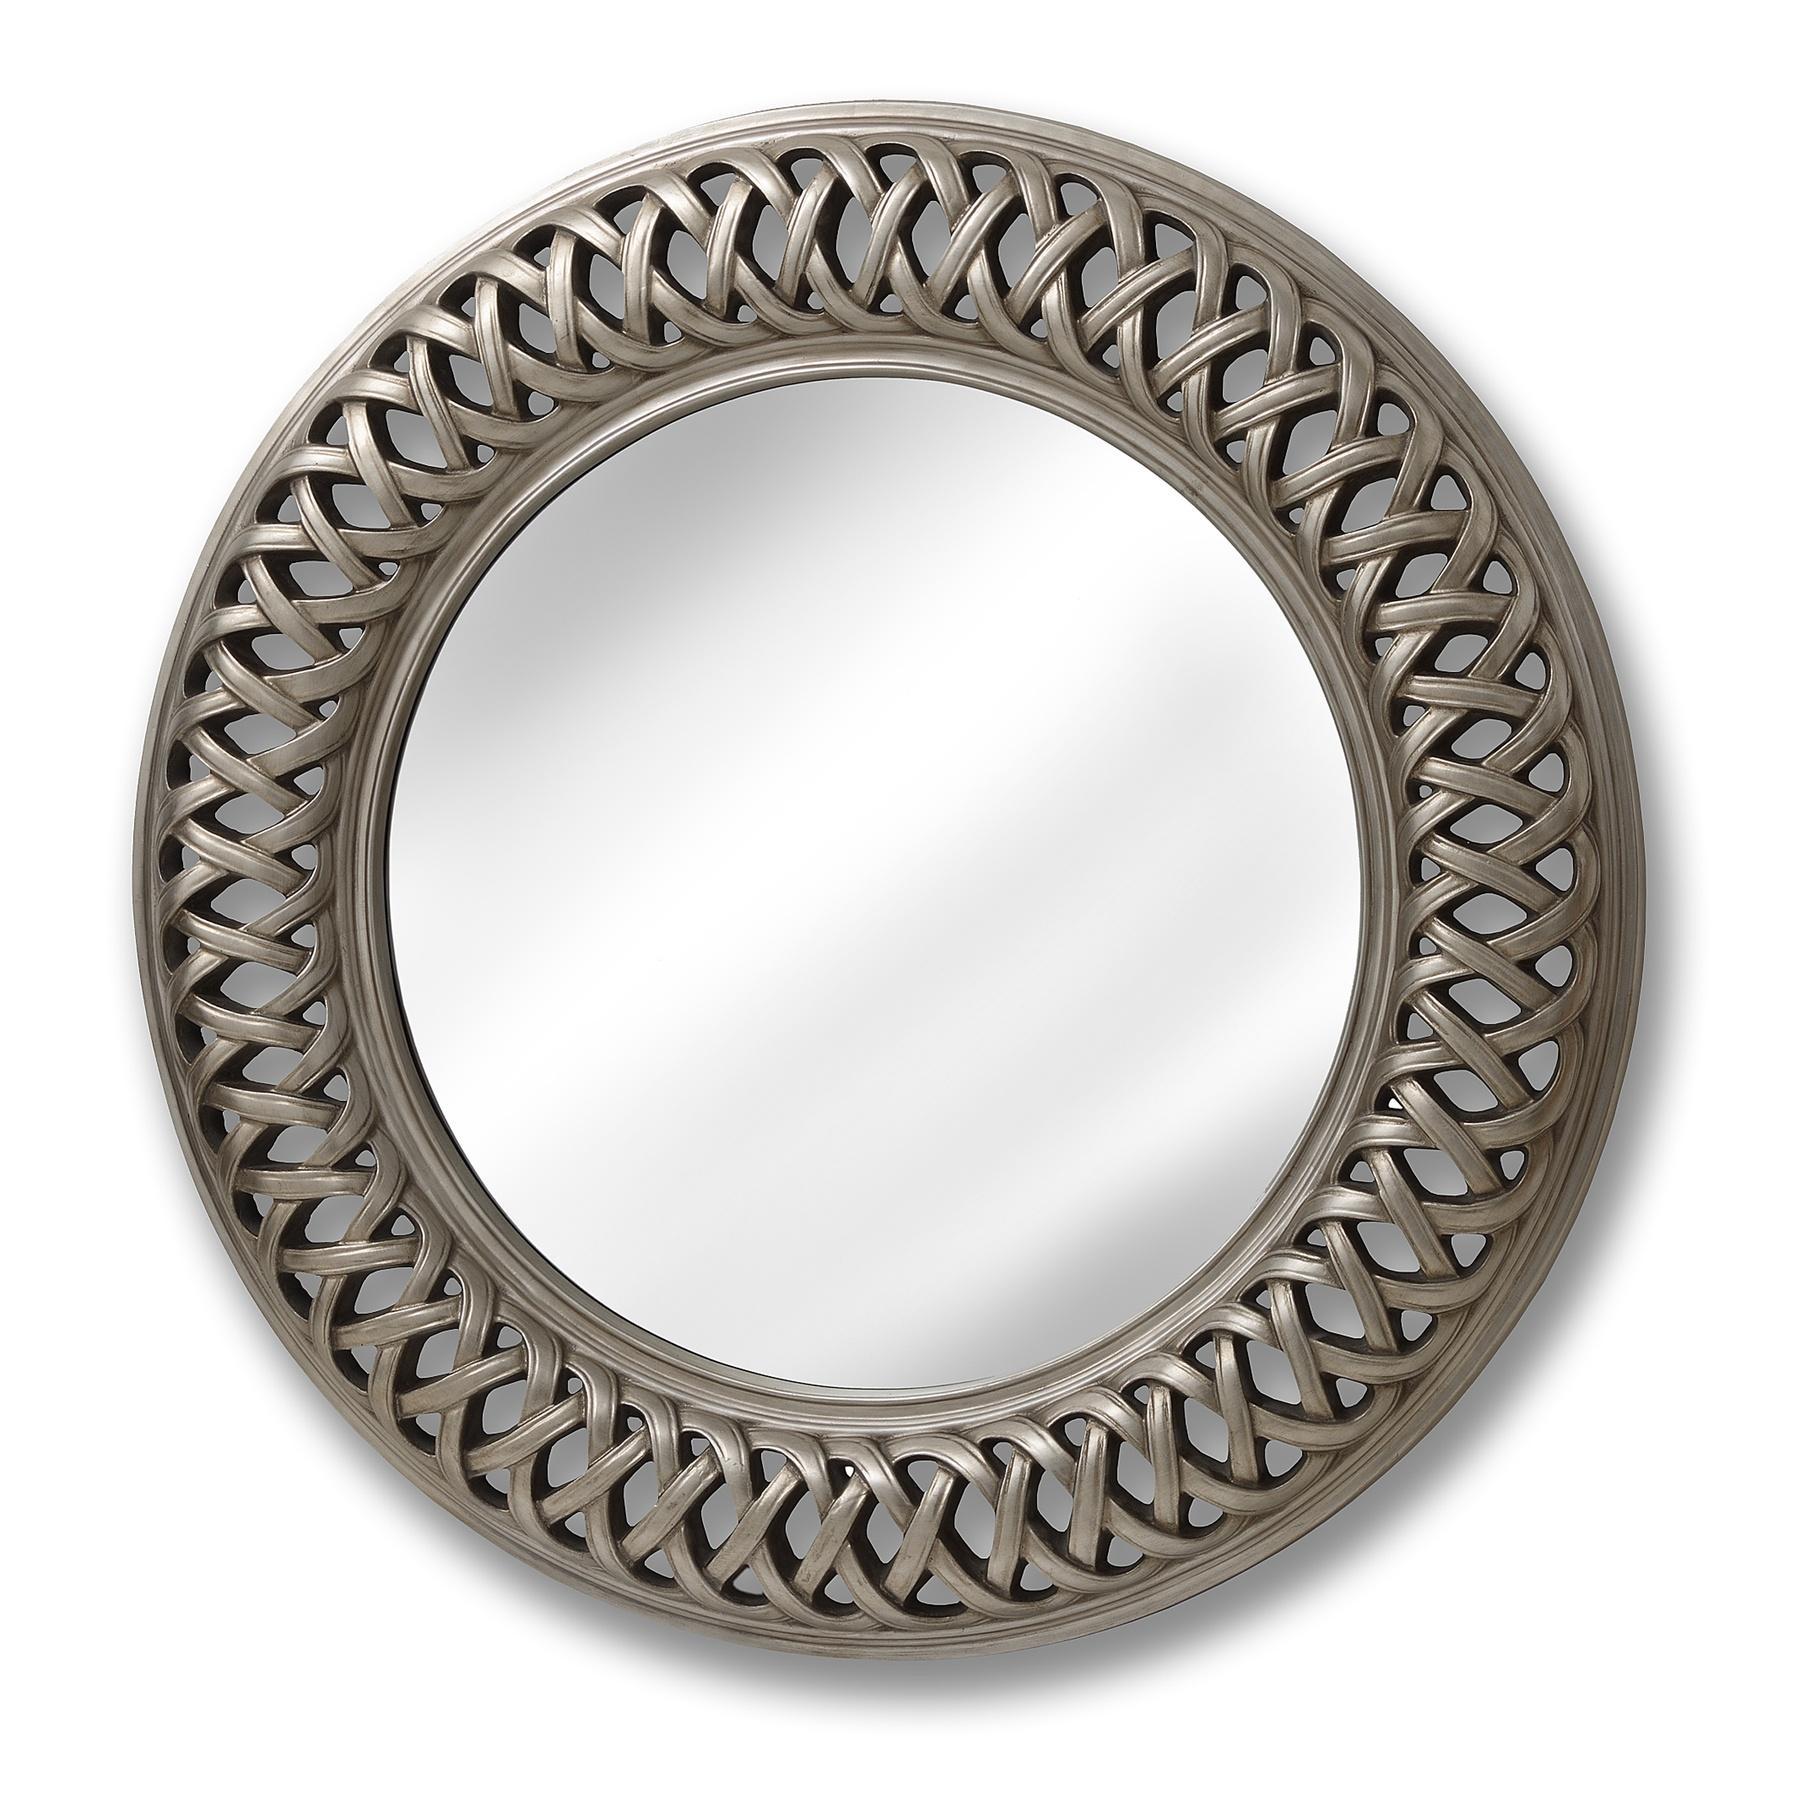 Entwined Lattice Silver Mirror